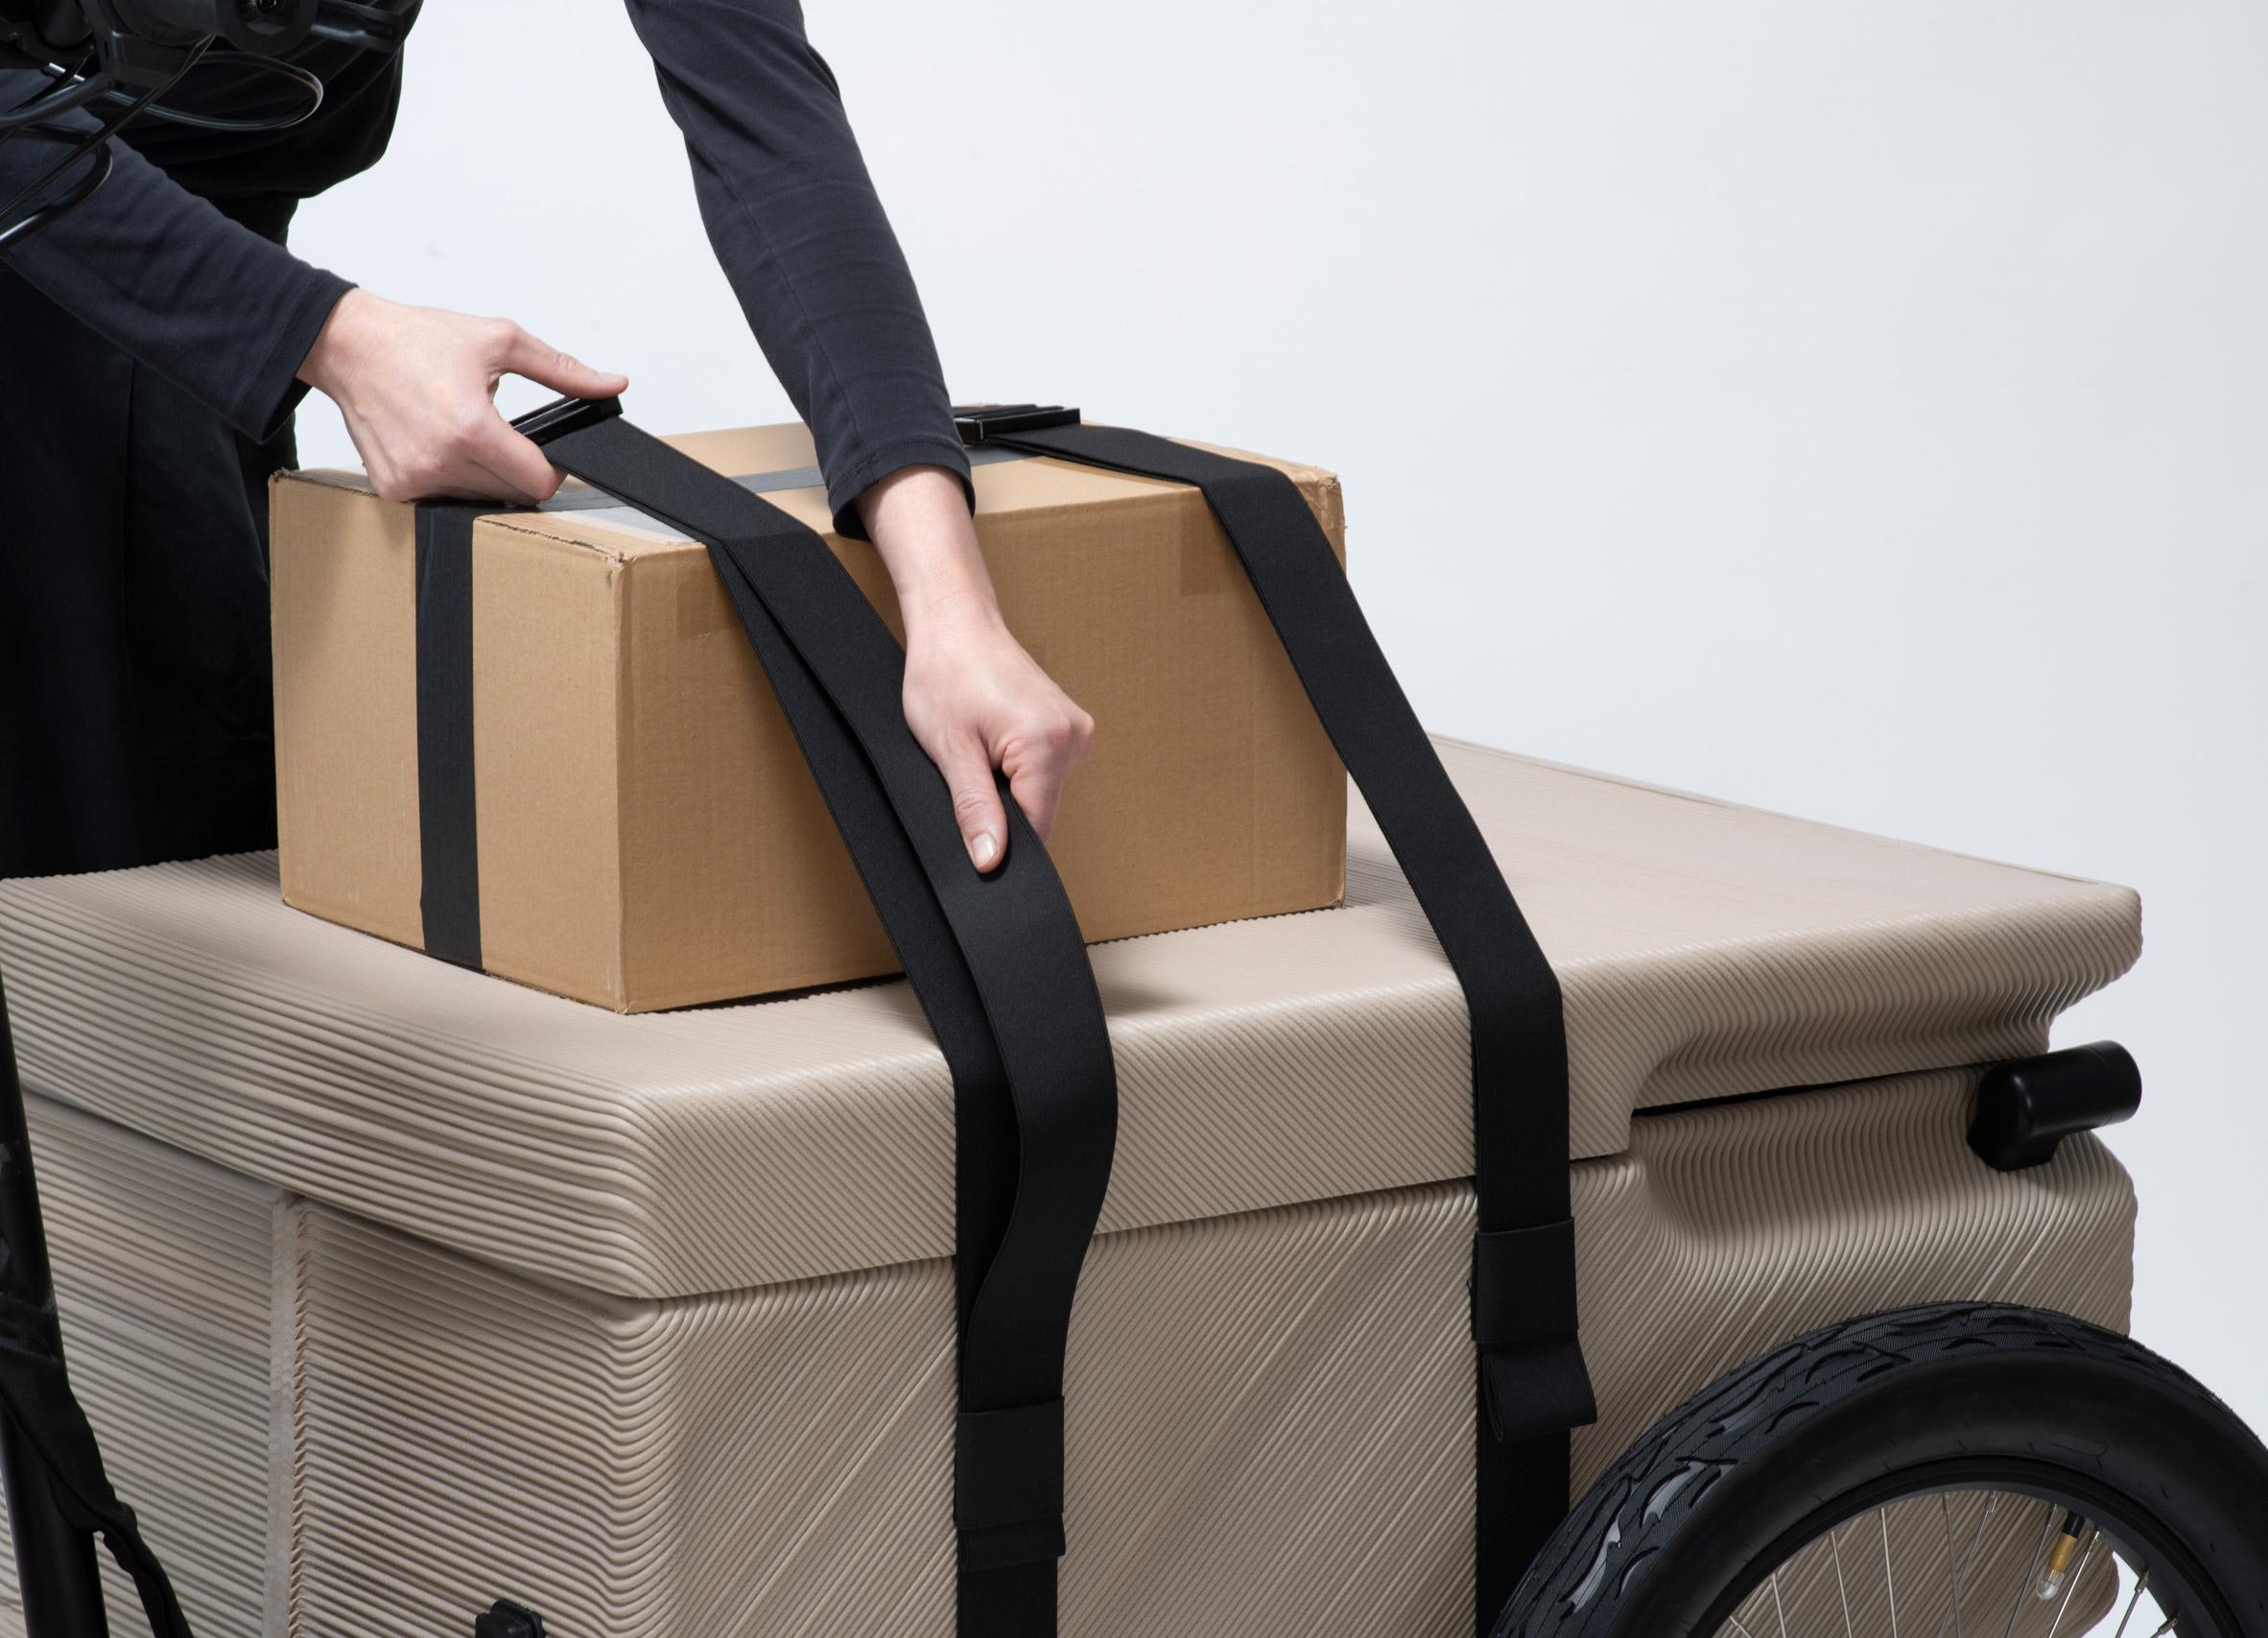 Cardboard box strapped onto transport box of ZUV